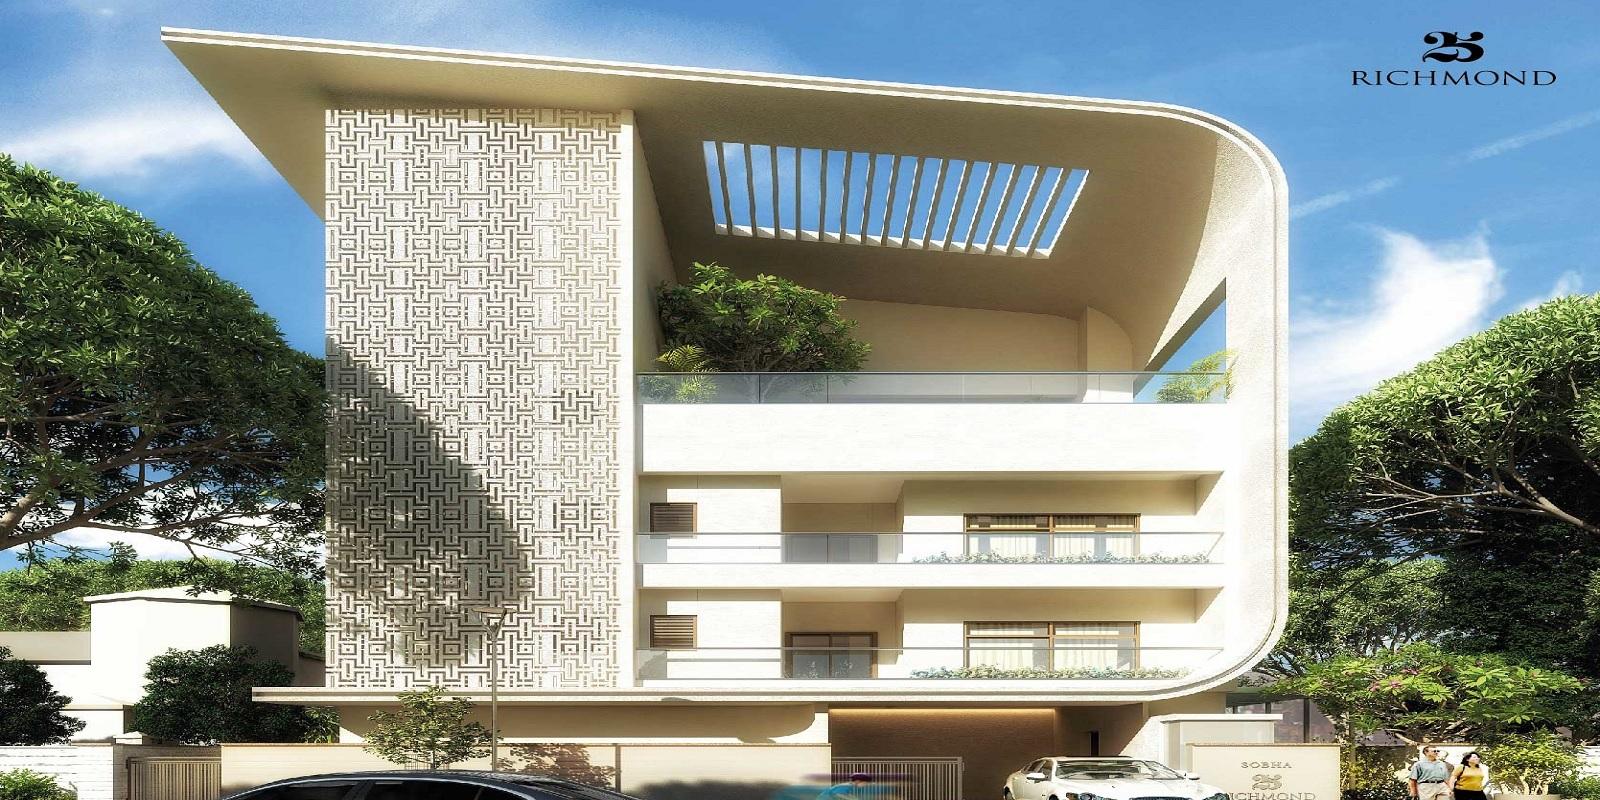 sobha 25 richmond project project large image1